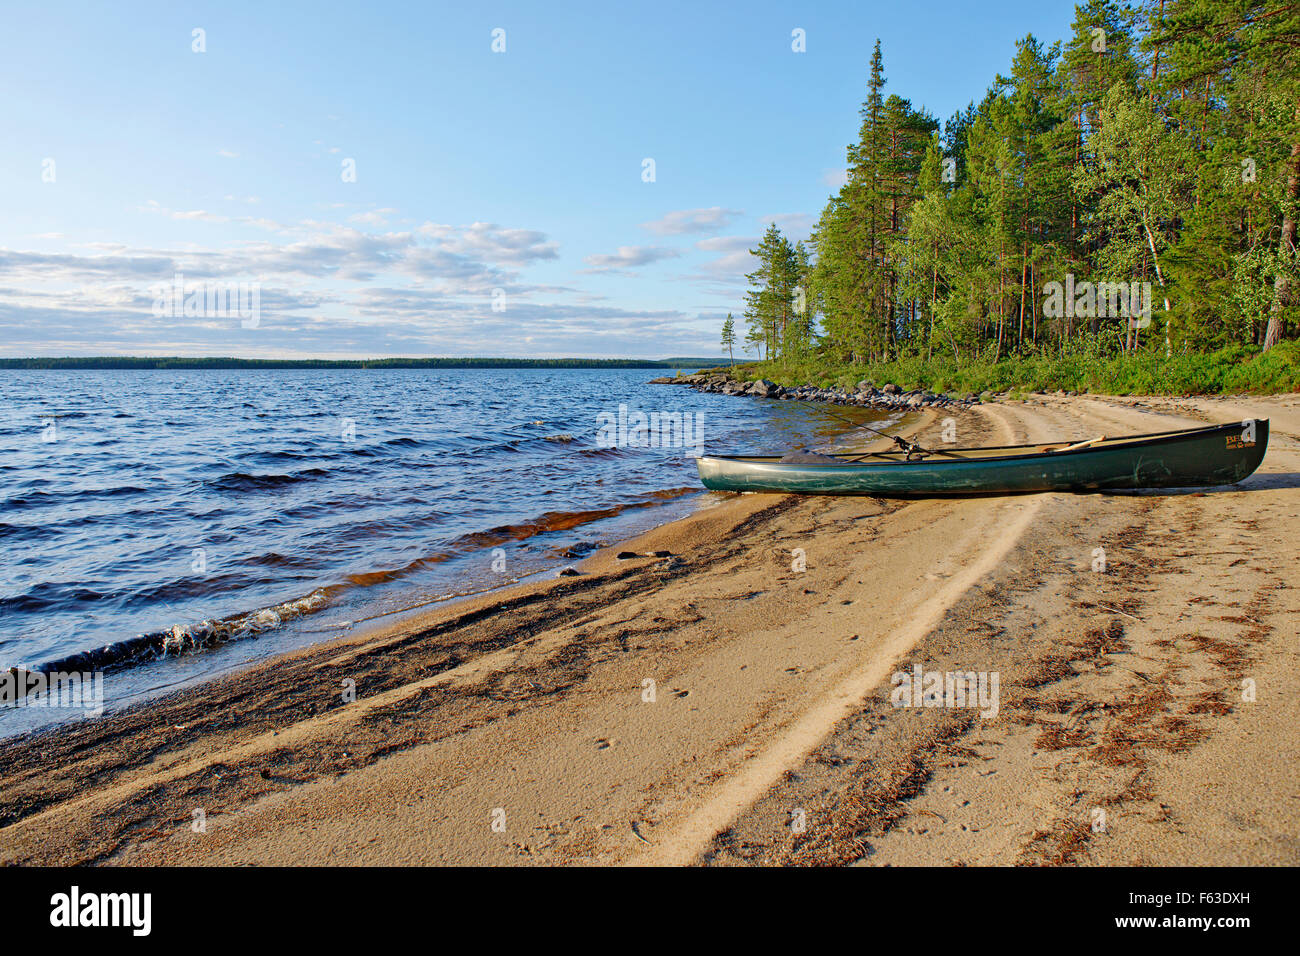 Canoe on a beach at Lentua lake, Kuhmo, Finland. - Stock Image